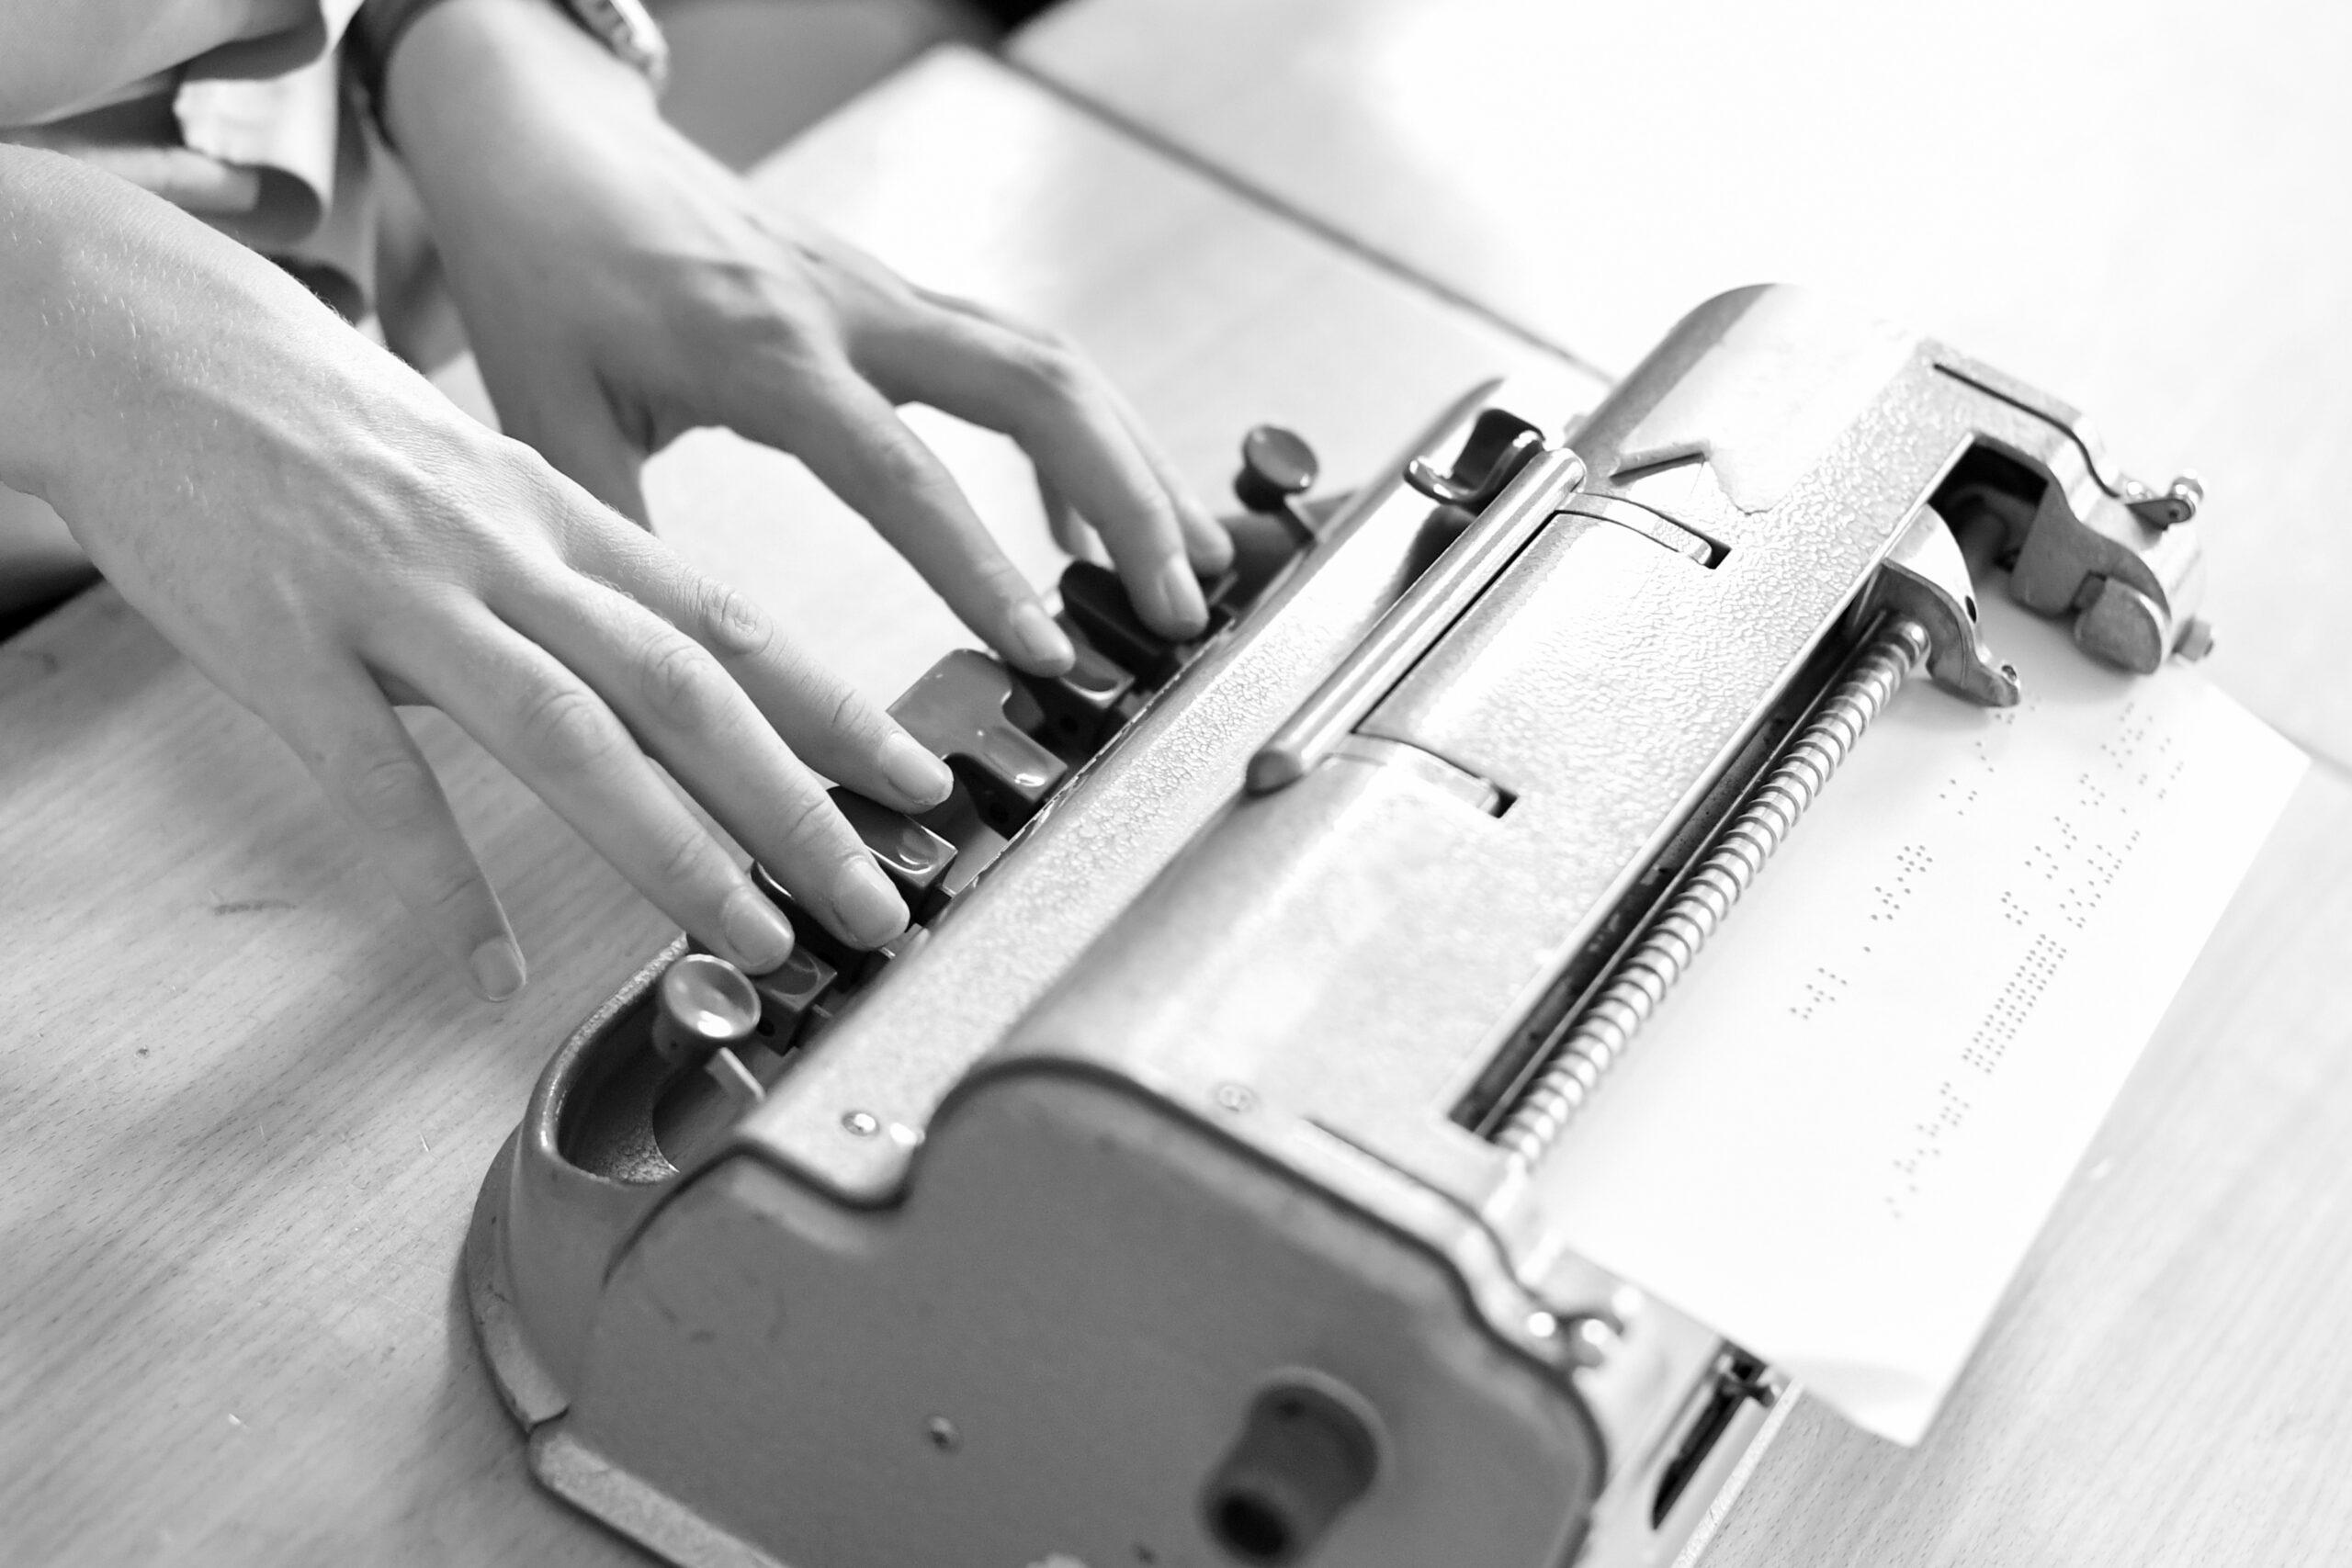 Perkins Brailler with hands